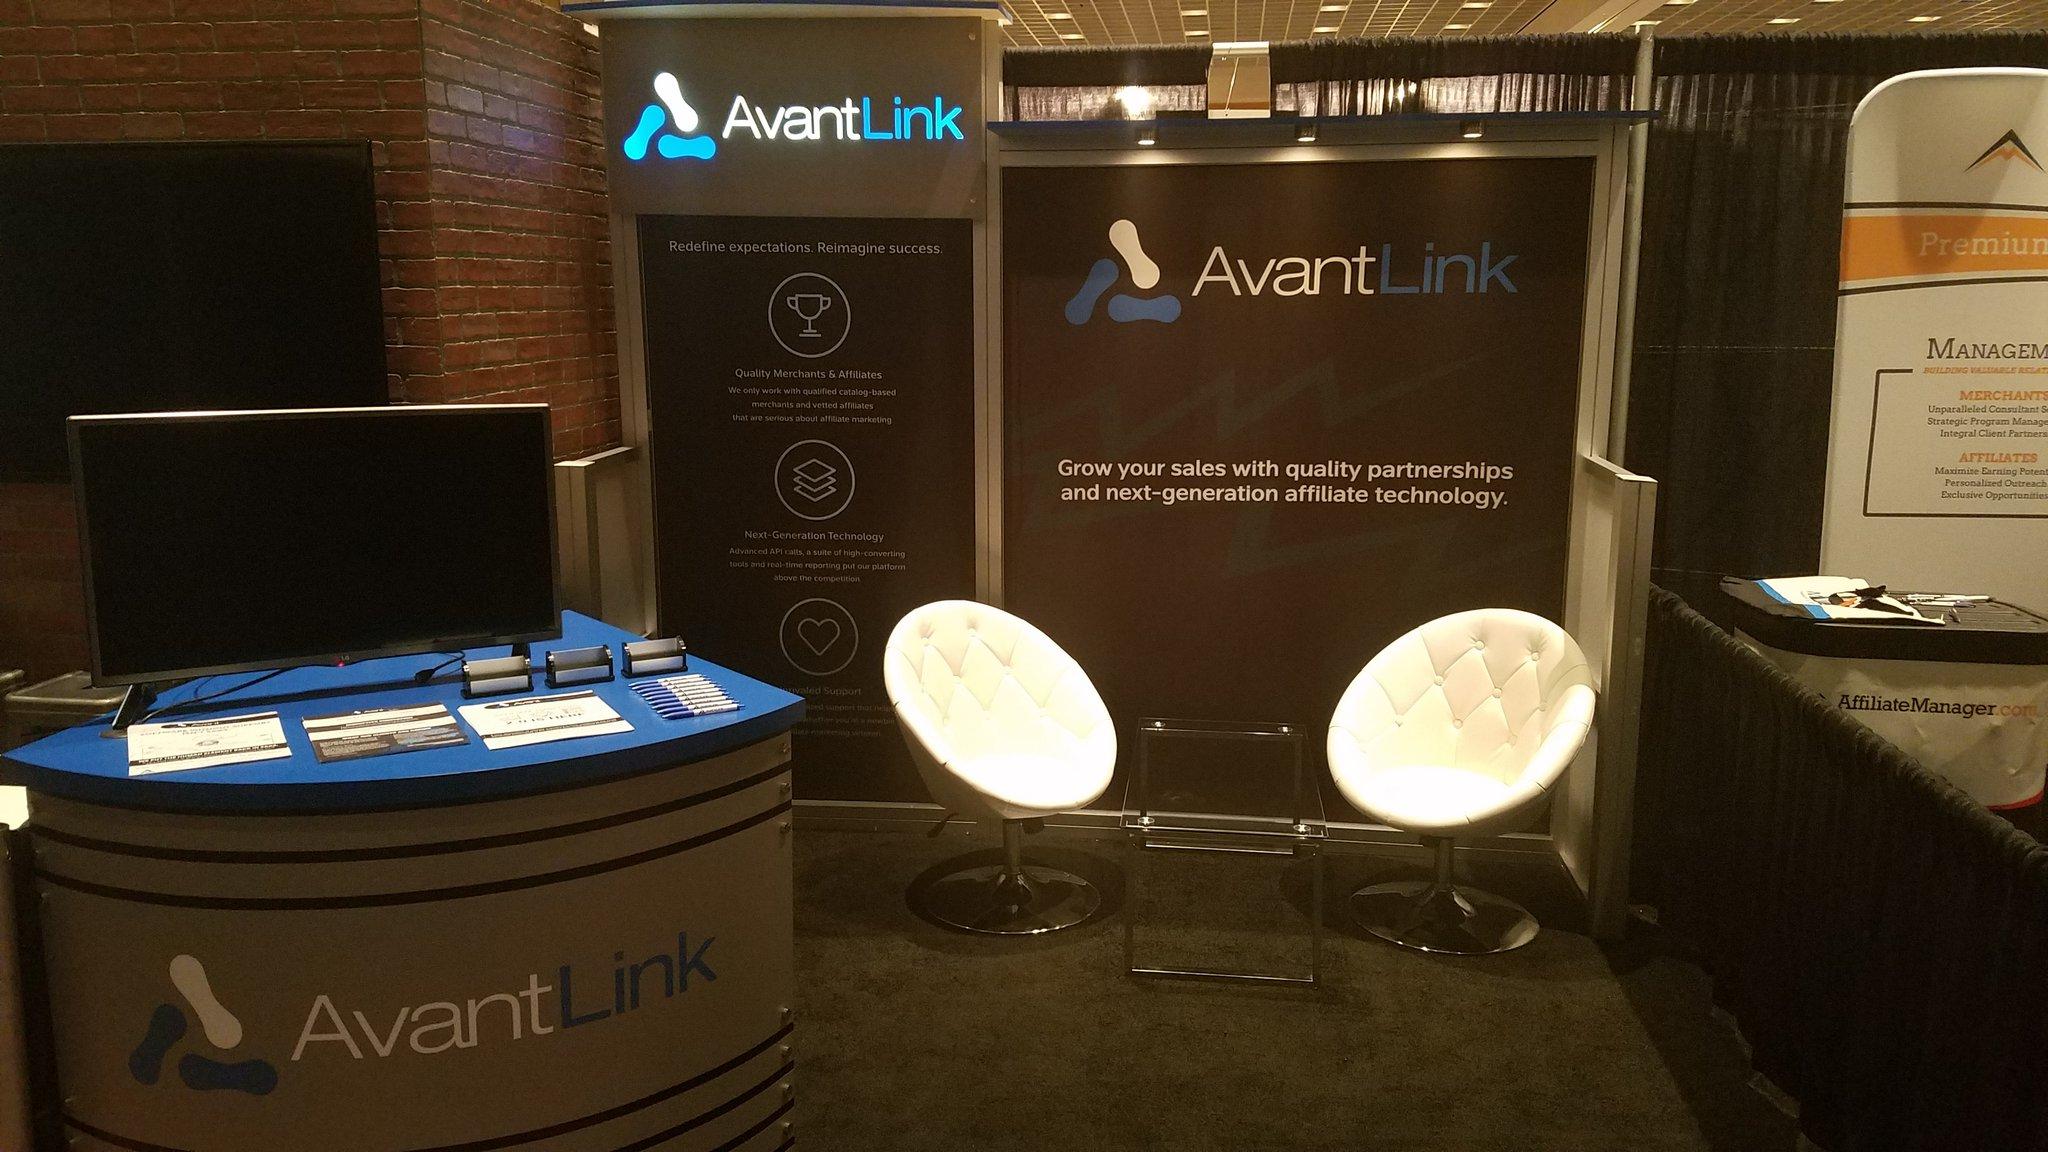 AvantLink at ASW 17